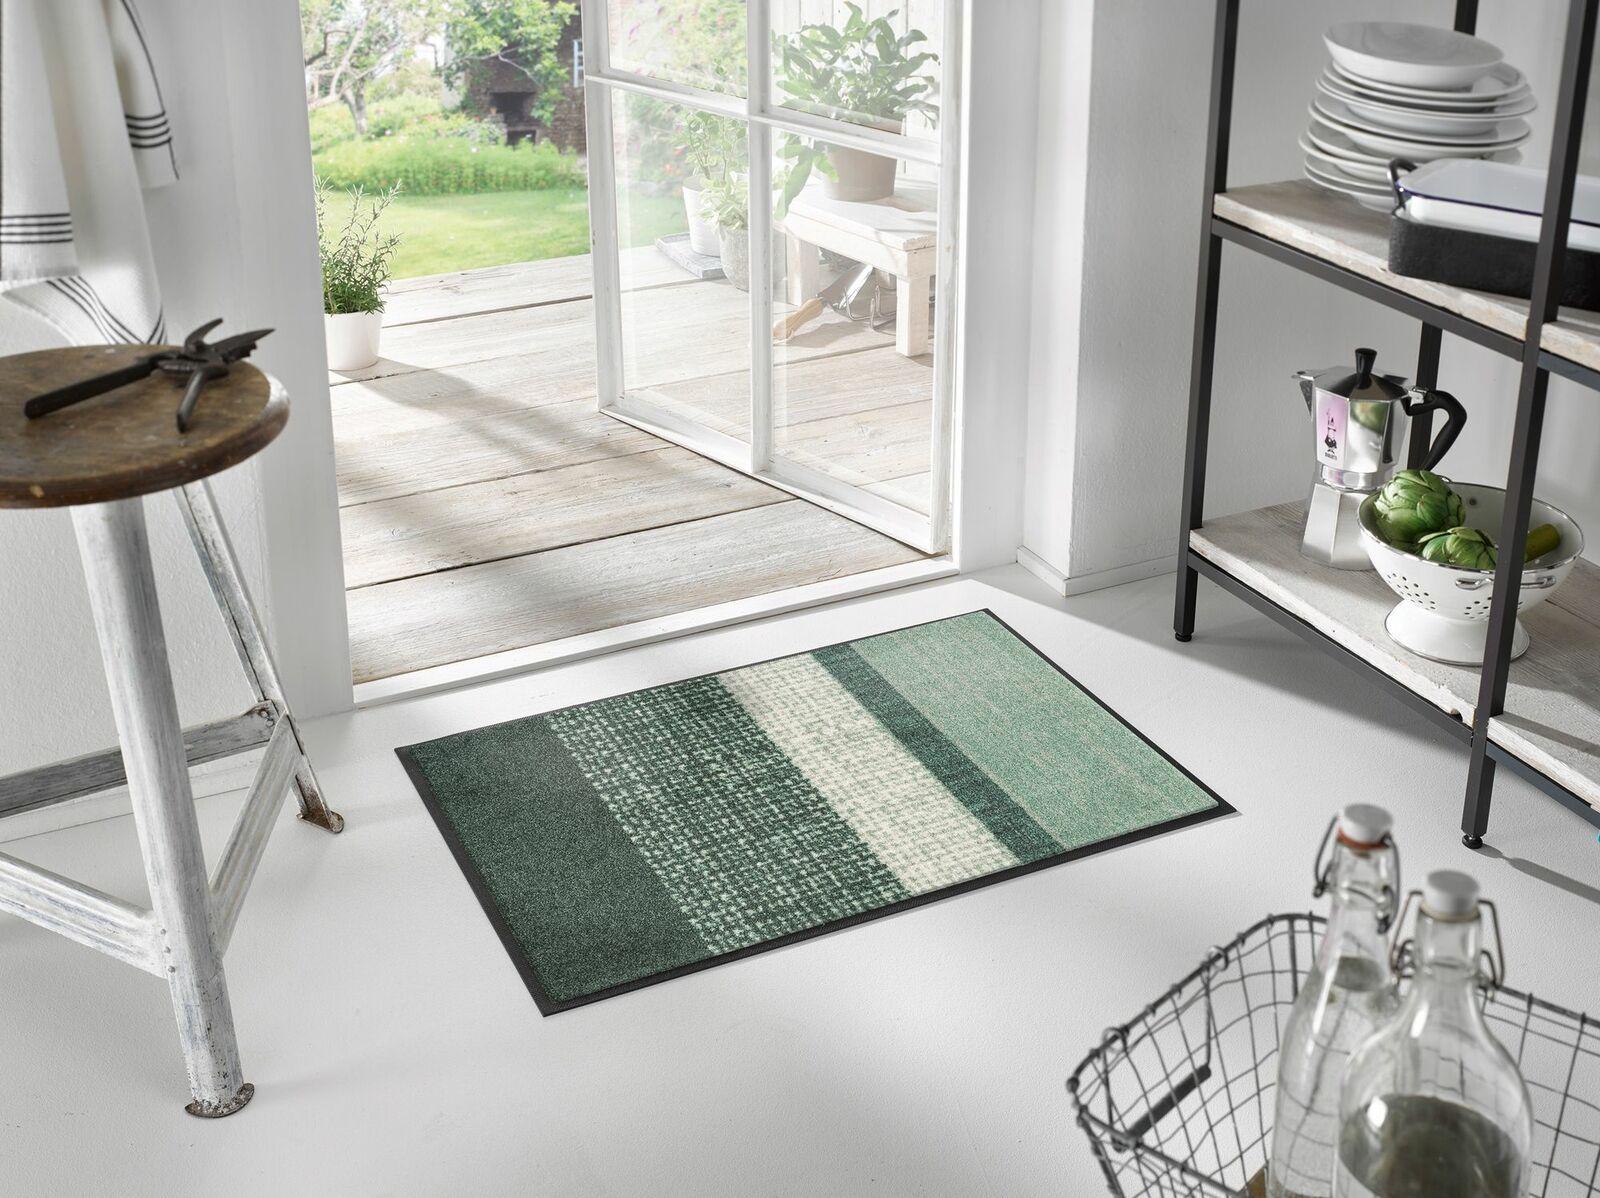 outlet WASH + Dry Zerbino Lynna pannolino sporco sporco sporco tappetino, wohnmatte, alfiere  alta qualità